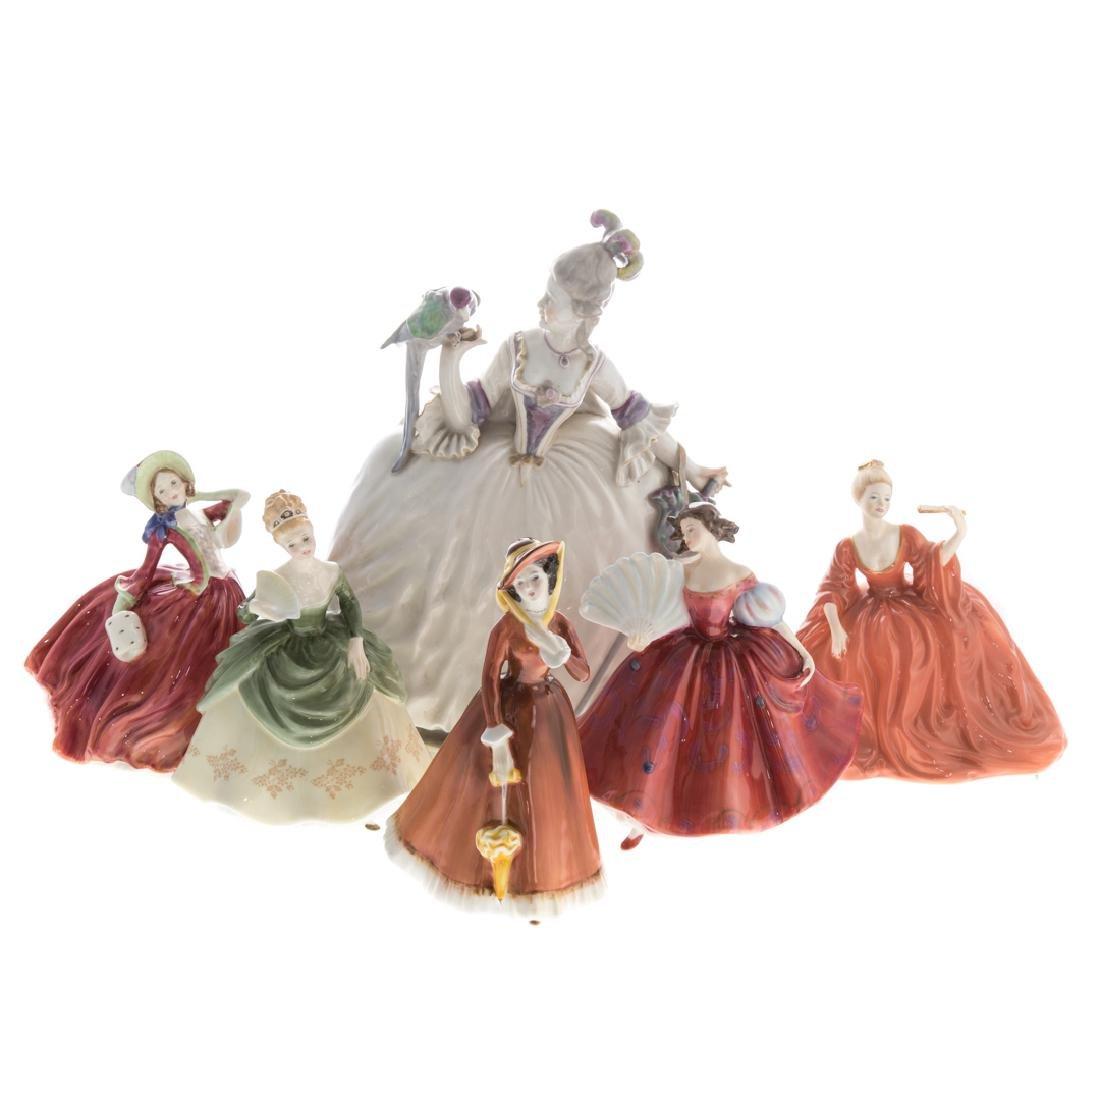 Six porcelain figures of ladies